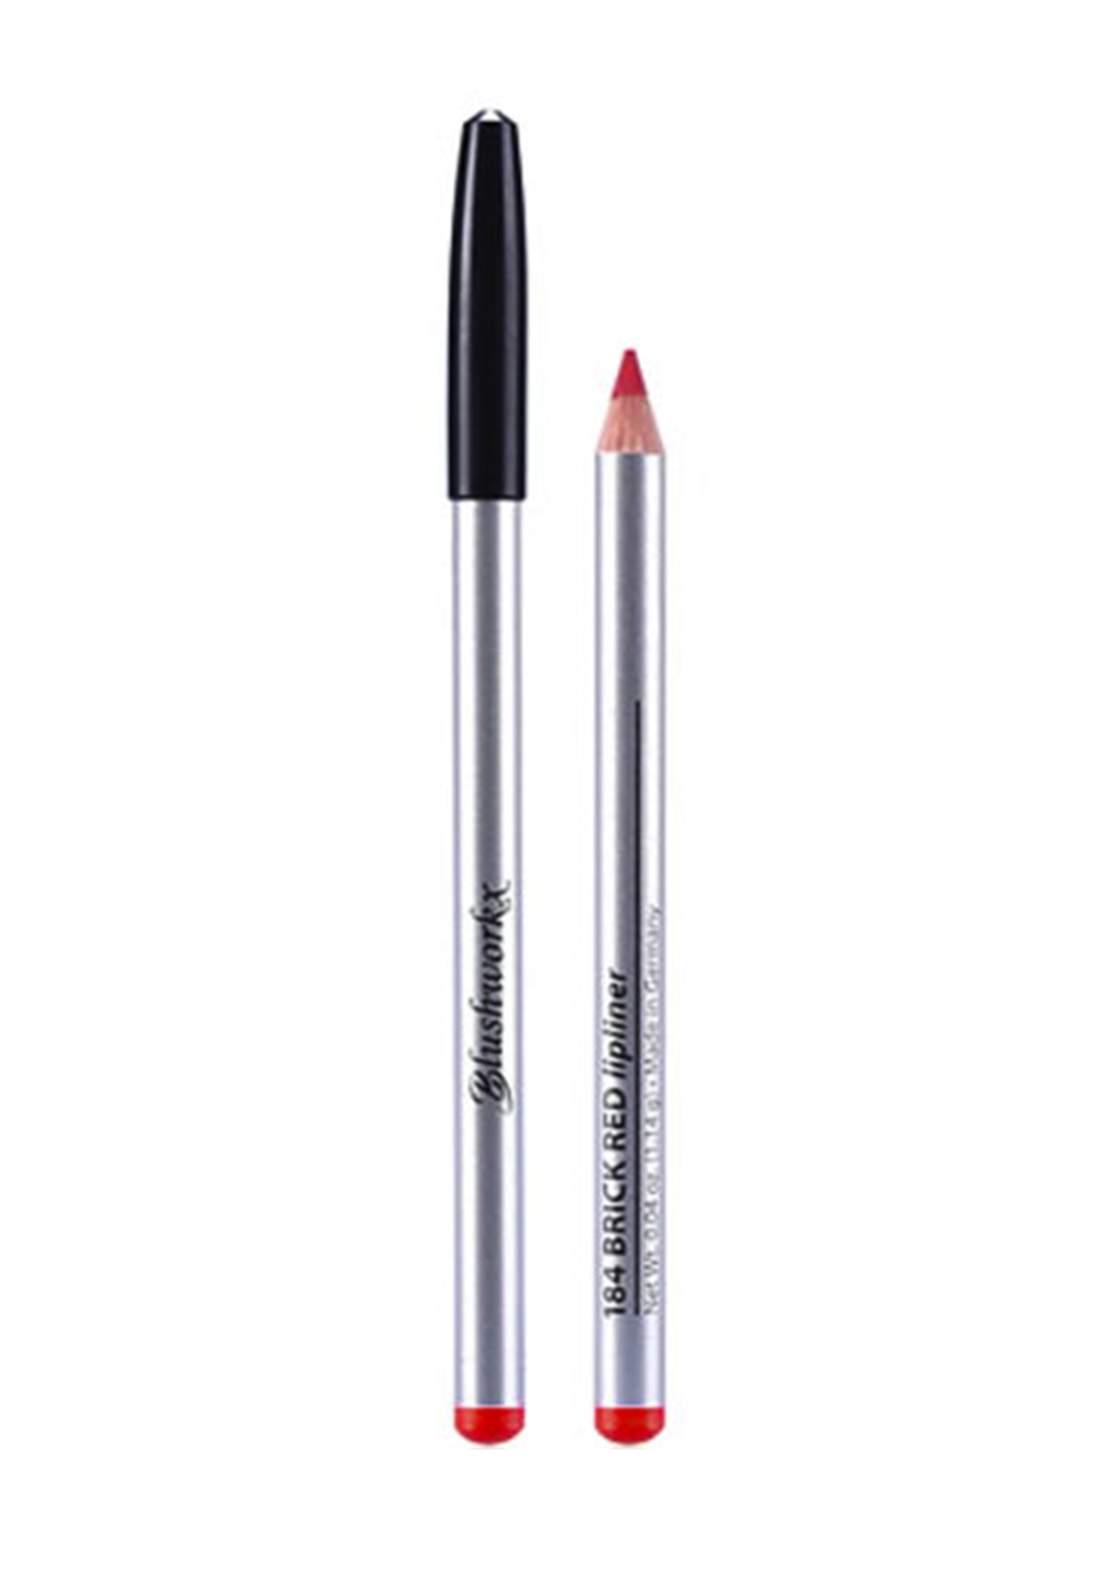 Blushworkx Hollywood Lip Liner Pencil No.191 Golden Gate 1.14g محدد الشفاه